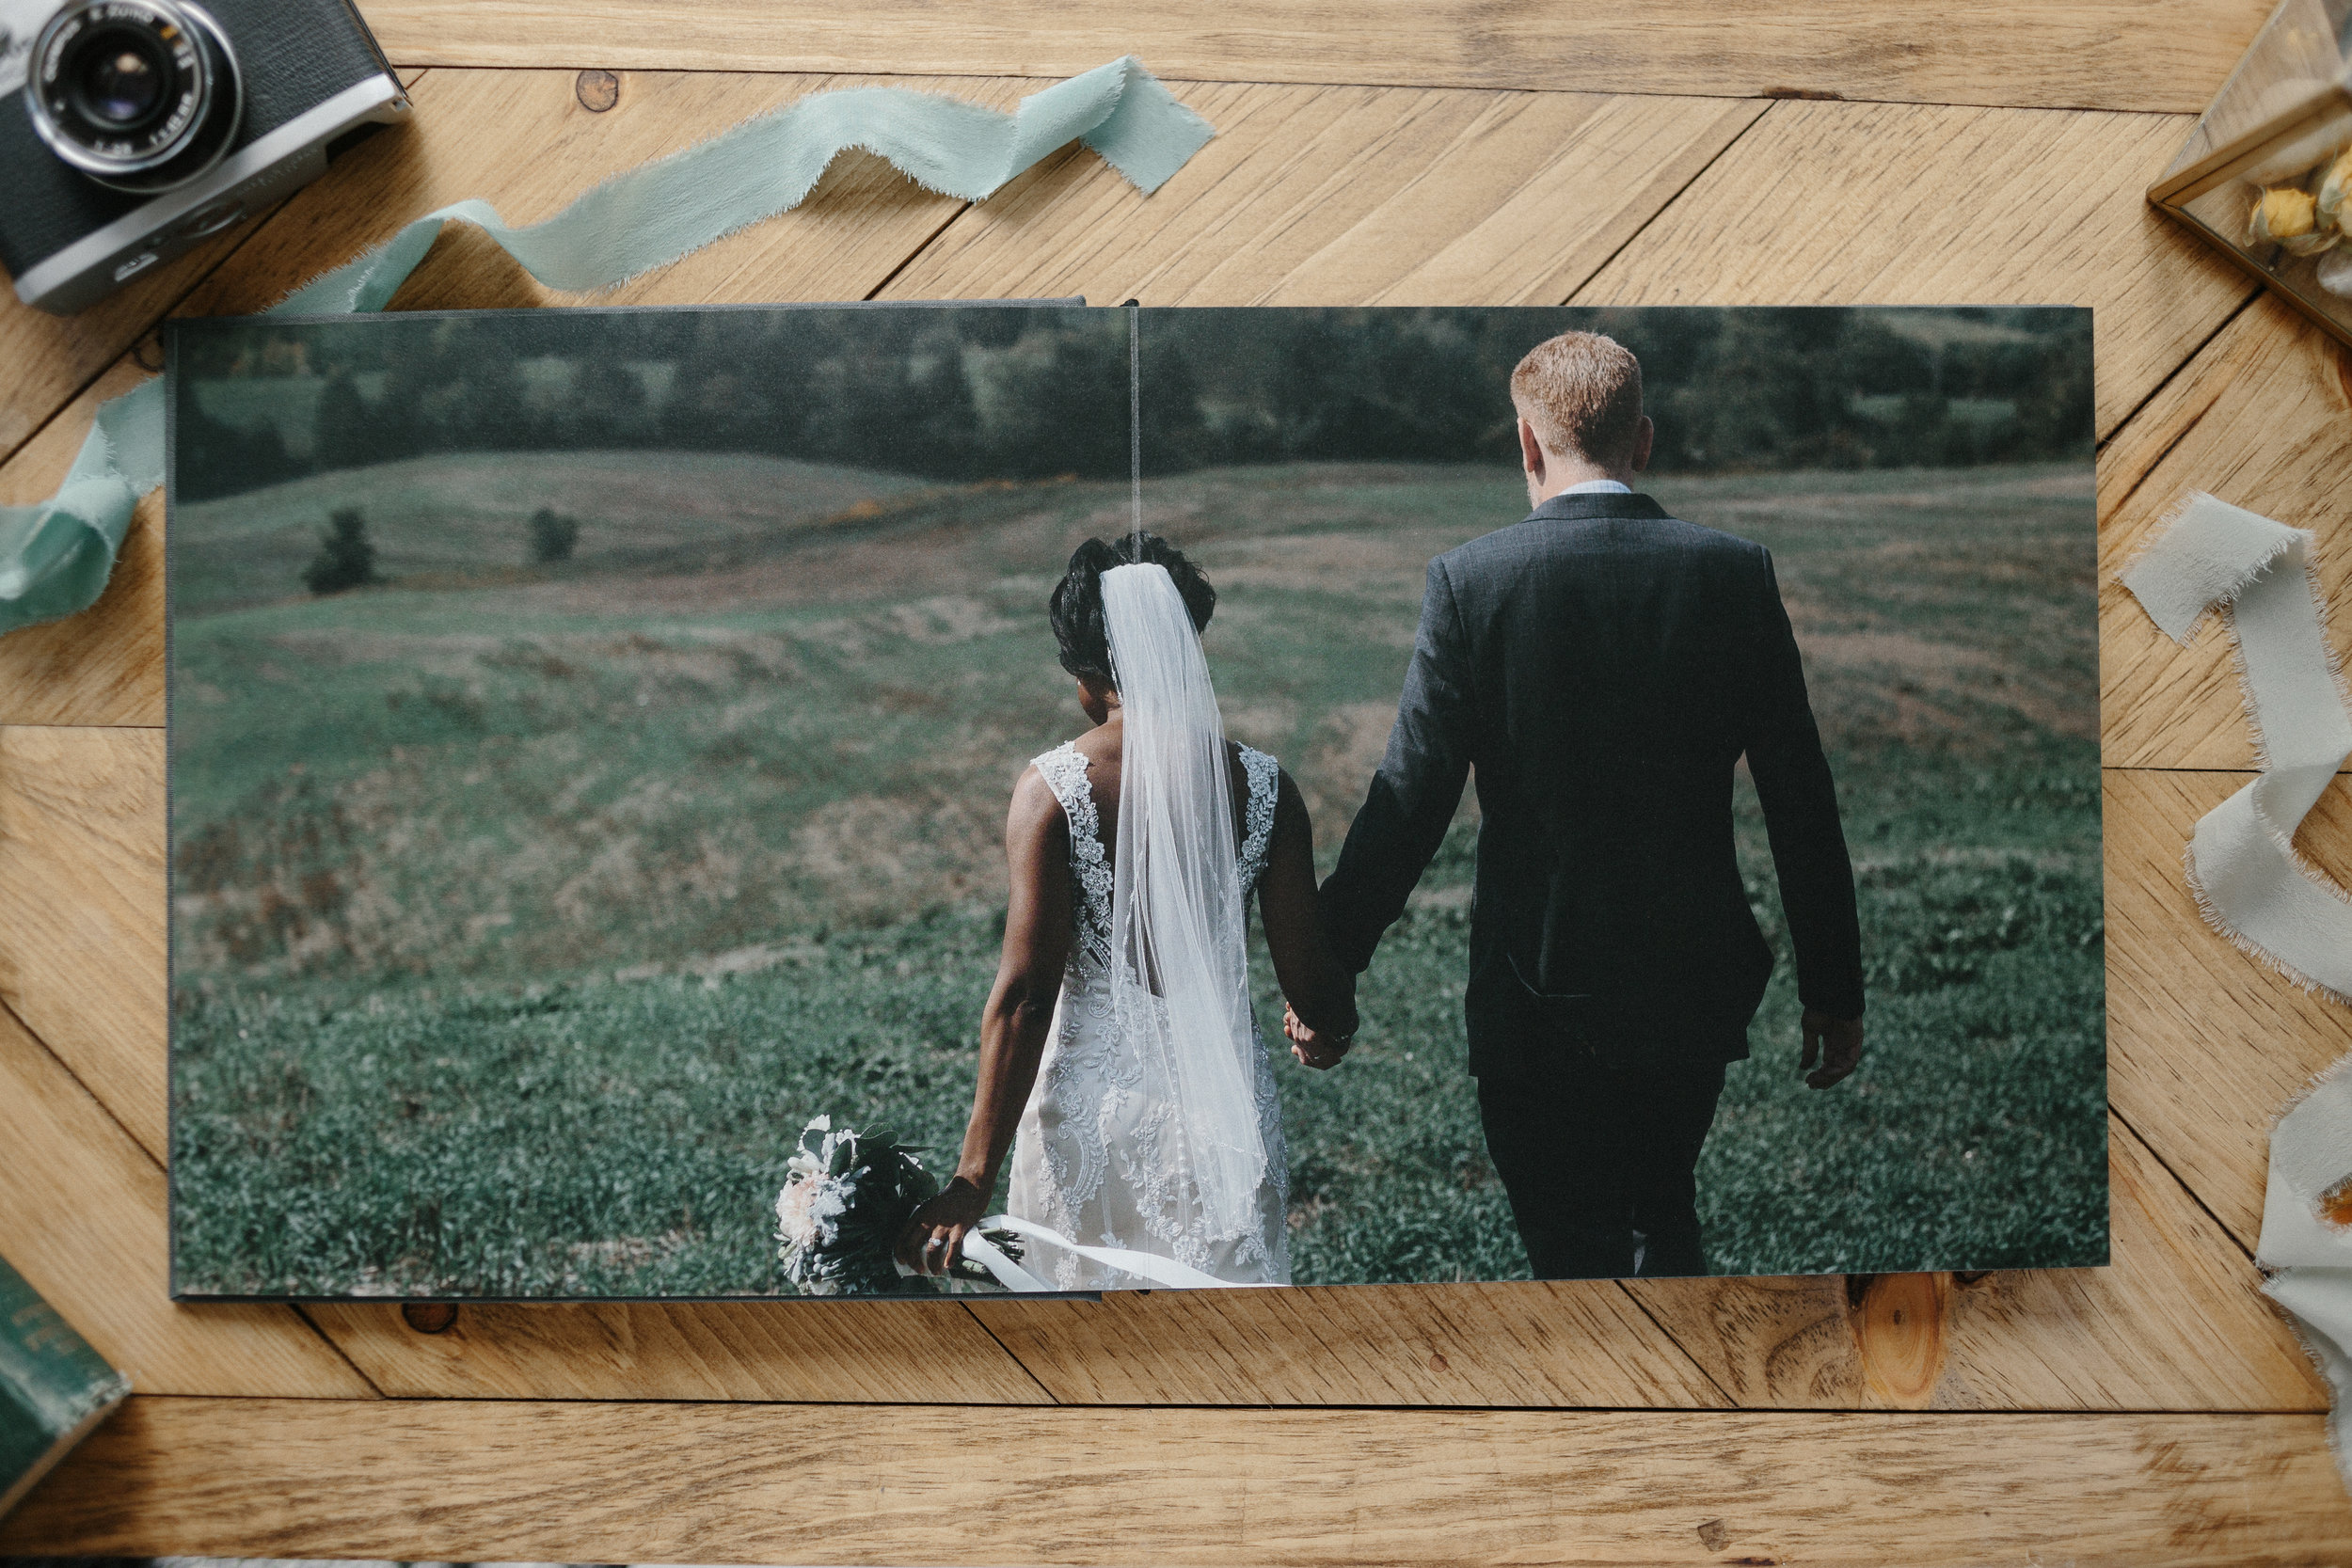 ryanne-hollies-photography-wedding-album-design-details-tono-and-co-artifact-uprising-97.jpg